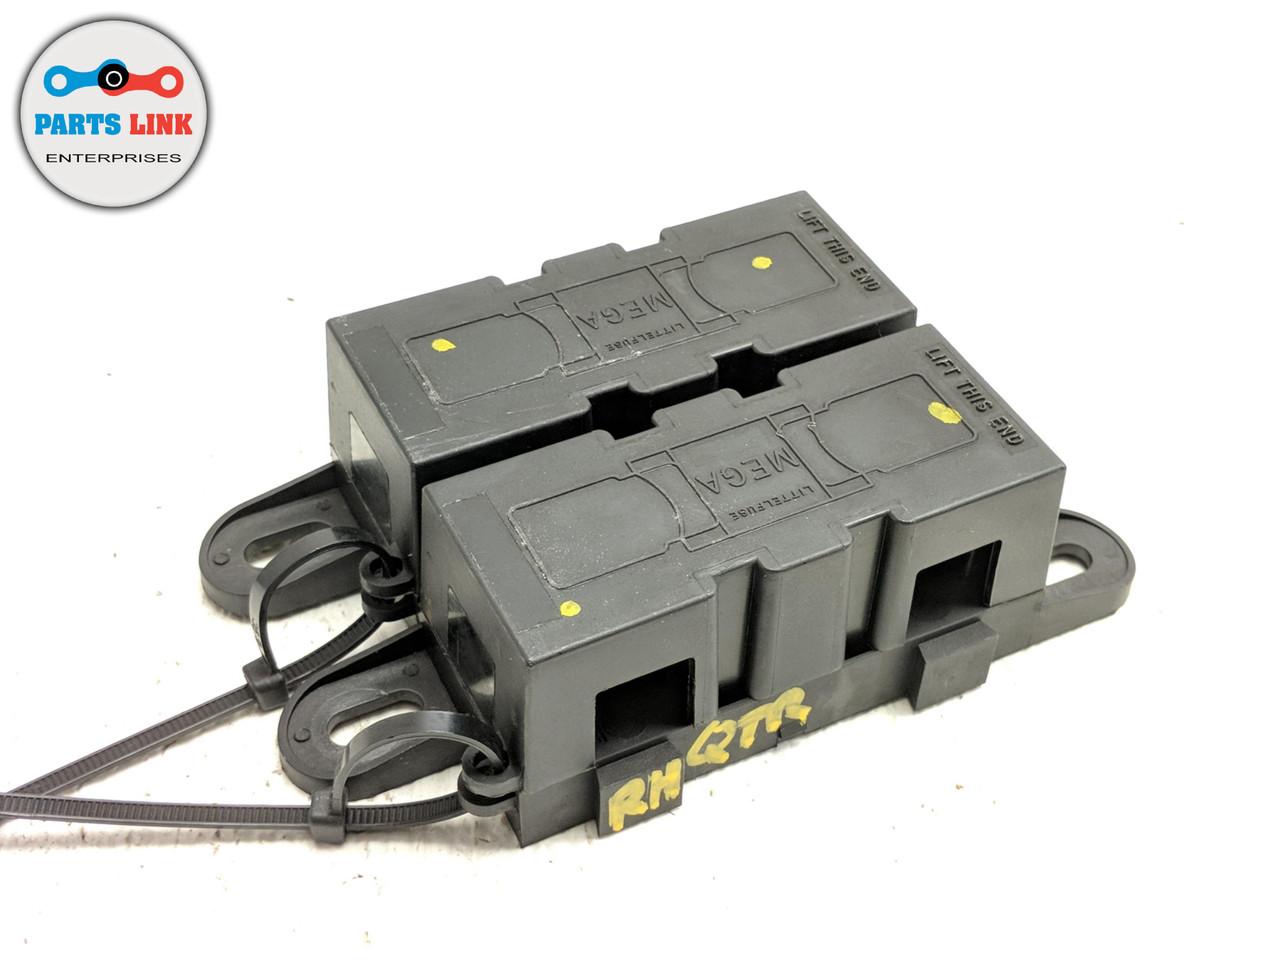 2014-2016 RANGE ROVER SPORT L494 RIGHT QUARTER PANEL MEGA FUSE BOX BLOCK  L405 - PARTS LINK ENT | 2014 Range Rover Sport Fuse Box |  | Parts Link Enterprise